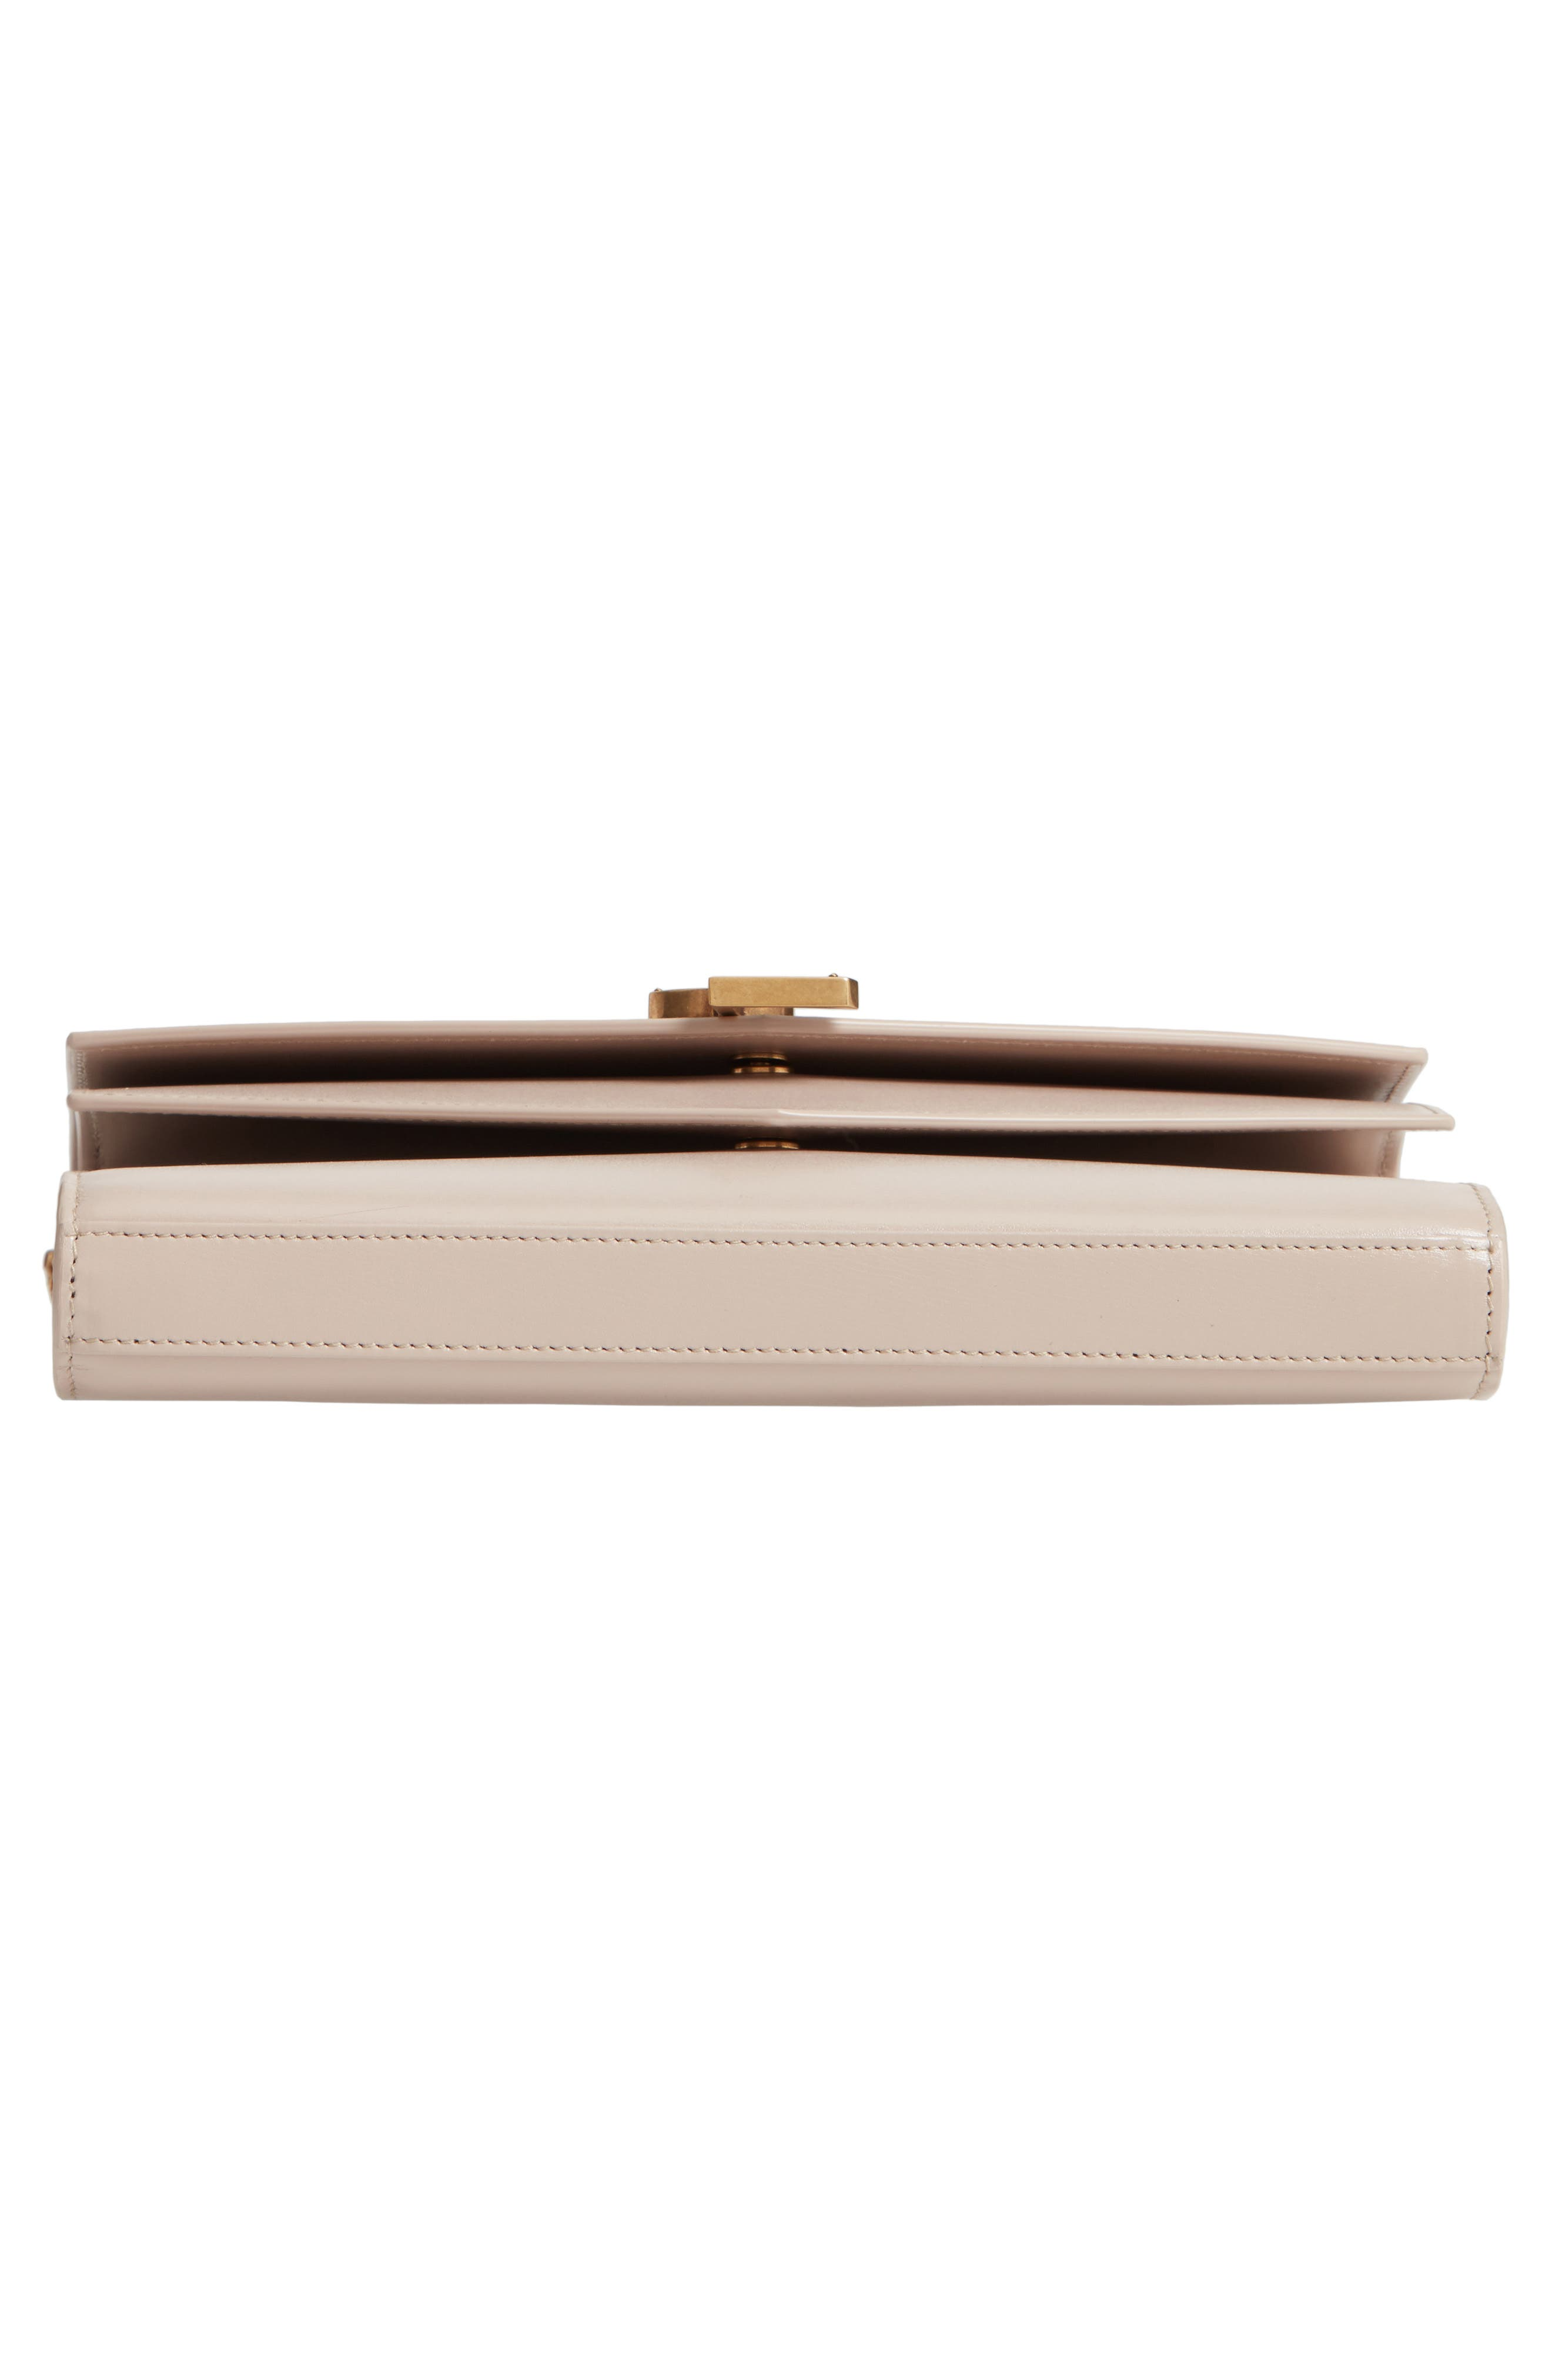 SAINT LAURENT, Sulpice Leather Crossbody Wallet, Alternate thumbnail 6, color, LIGHT NATURAL